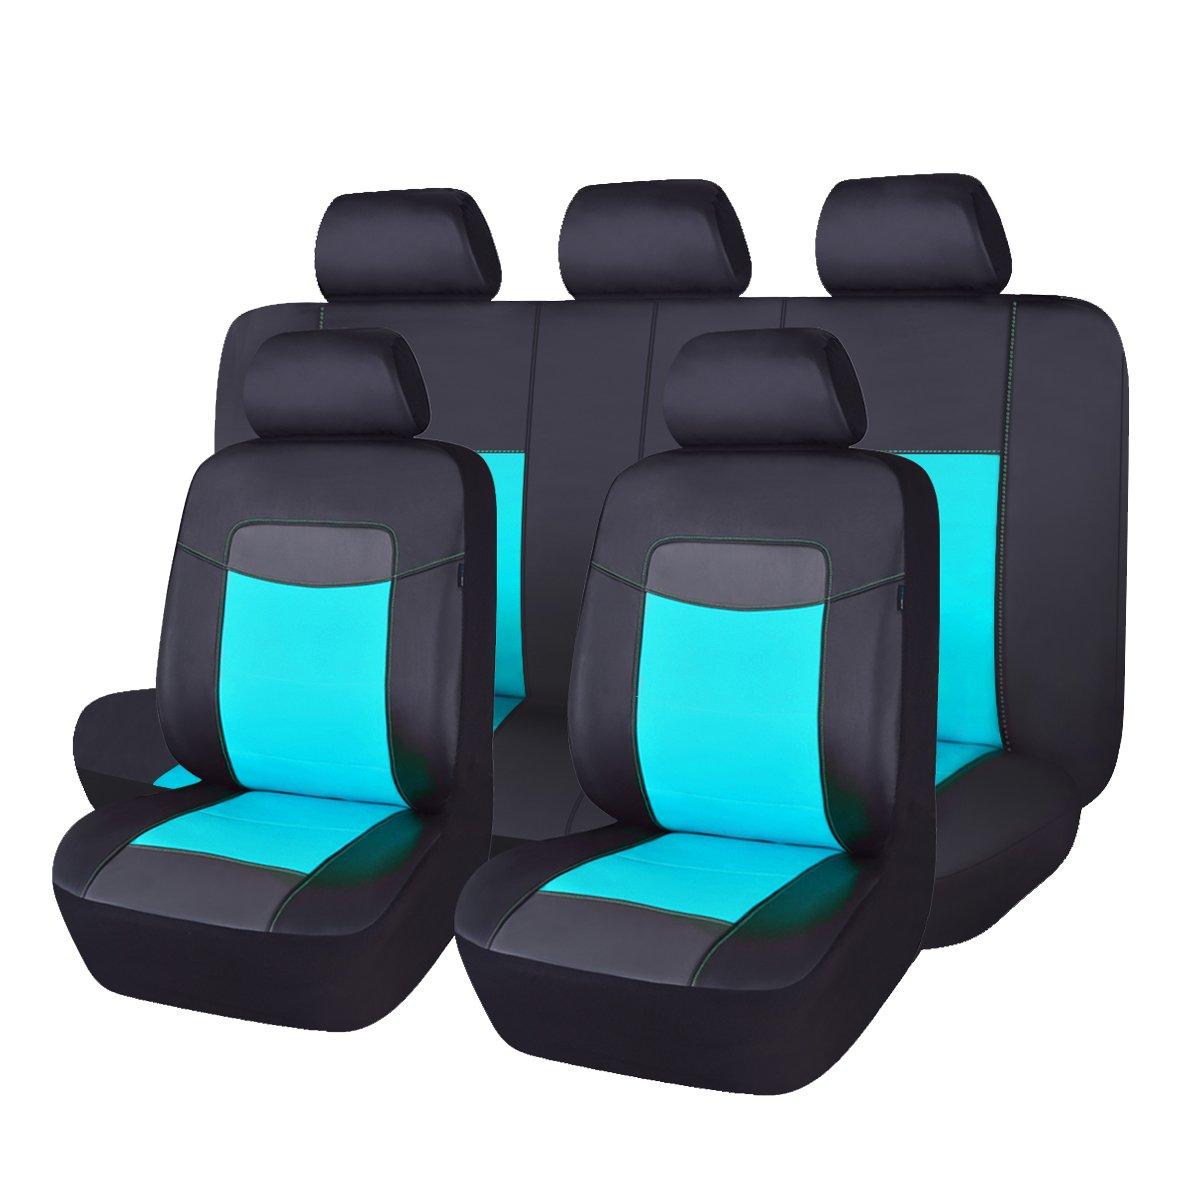 Flying Banner - Funda de piel sinté tica para asiento de coche, diseñ o universal con airbags laterales. diseño universal con airbags laterales. Ningbo Qiyang International Trade Co. Ltd FB-102018-0106